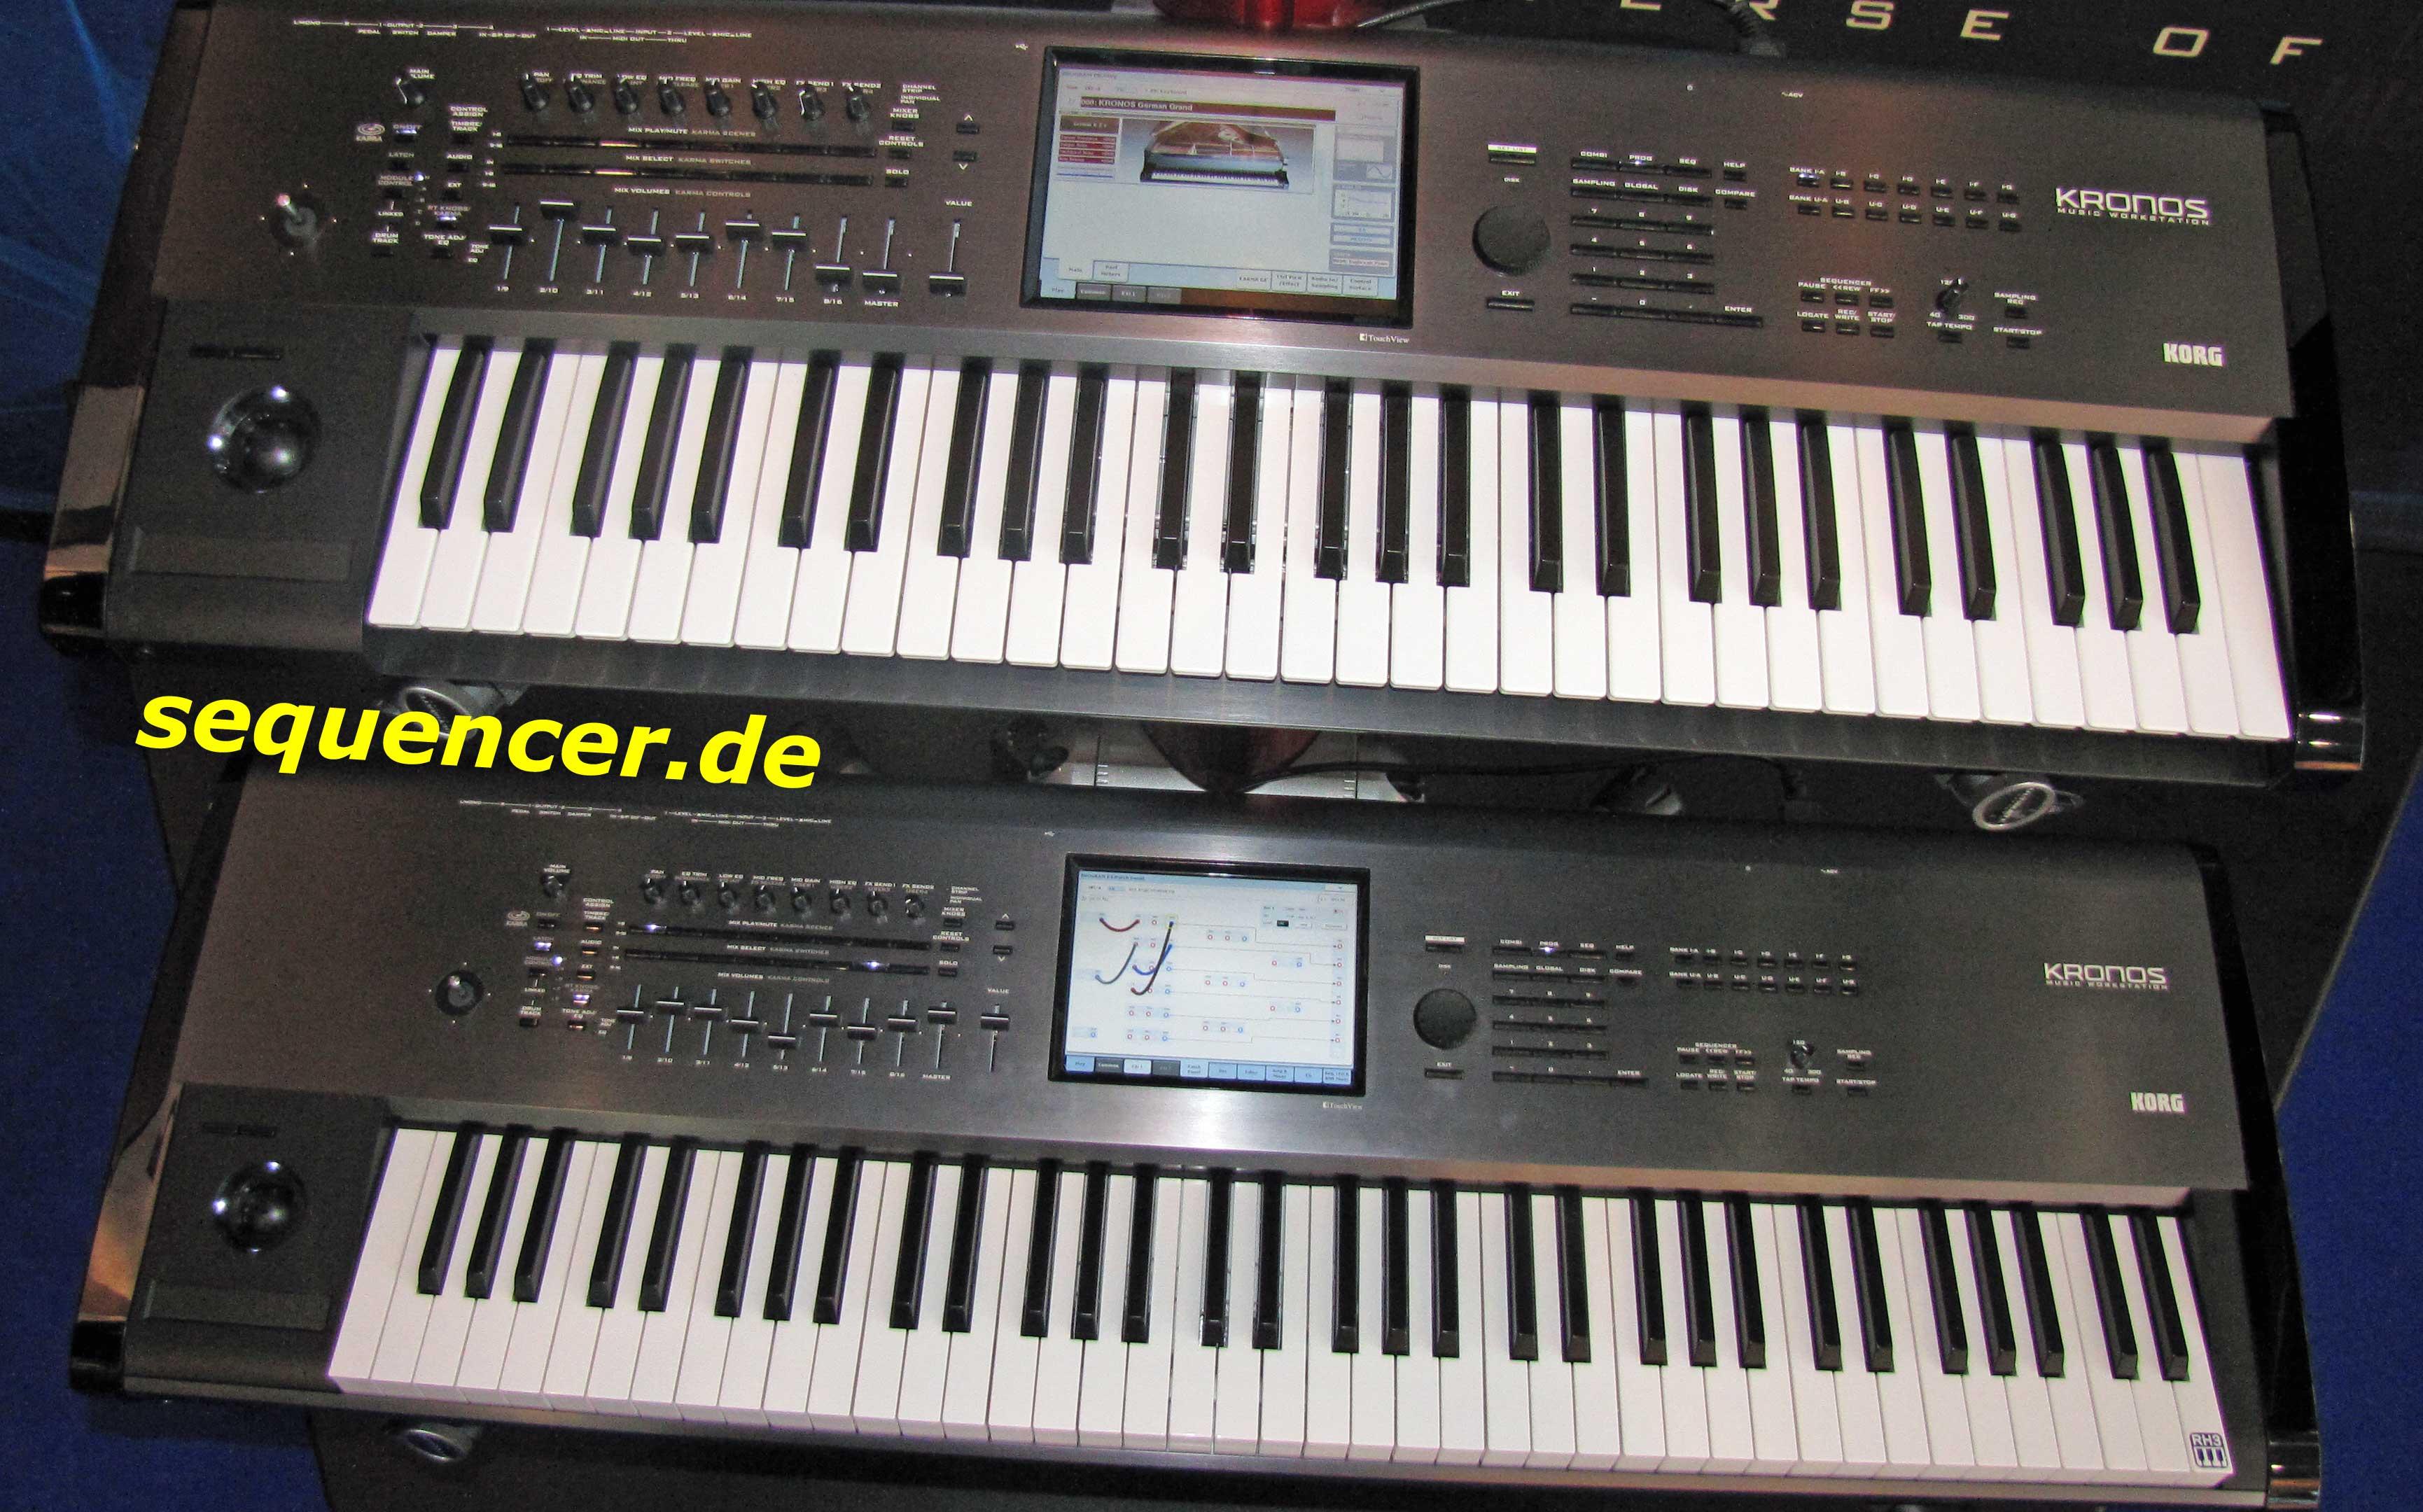 Korg Kronos Korg Kronos synthesizer